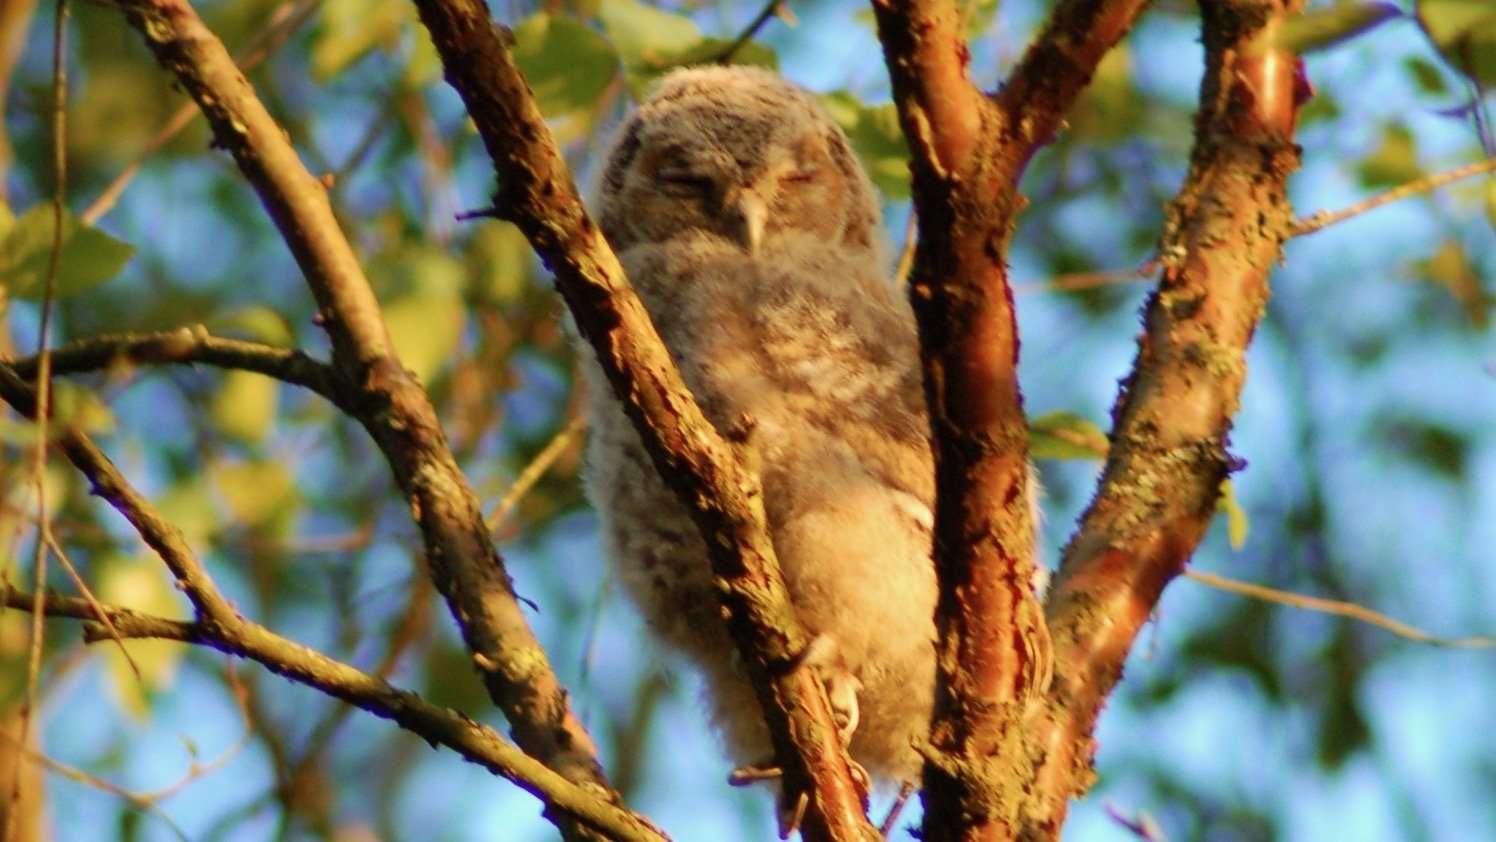 a super fluffy baby owl sleeps in a copper birch tree